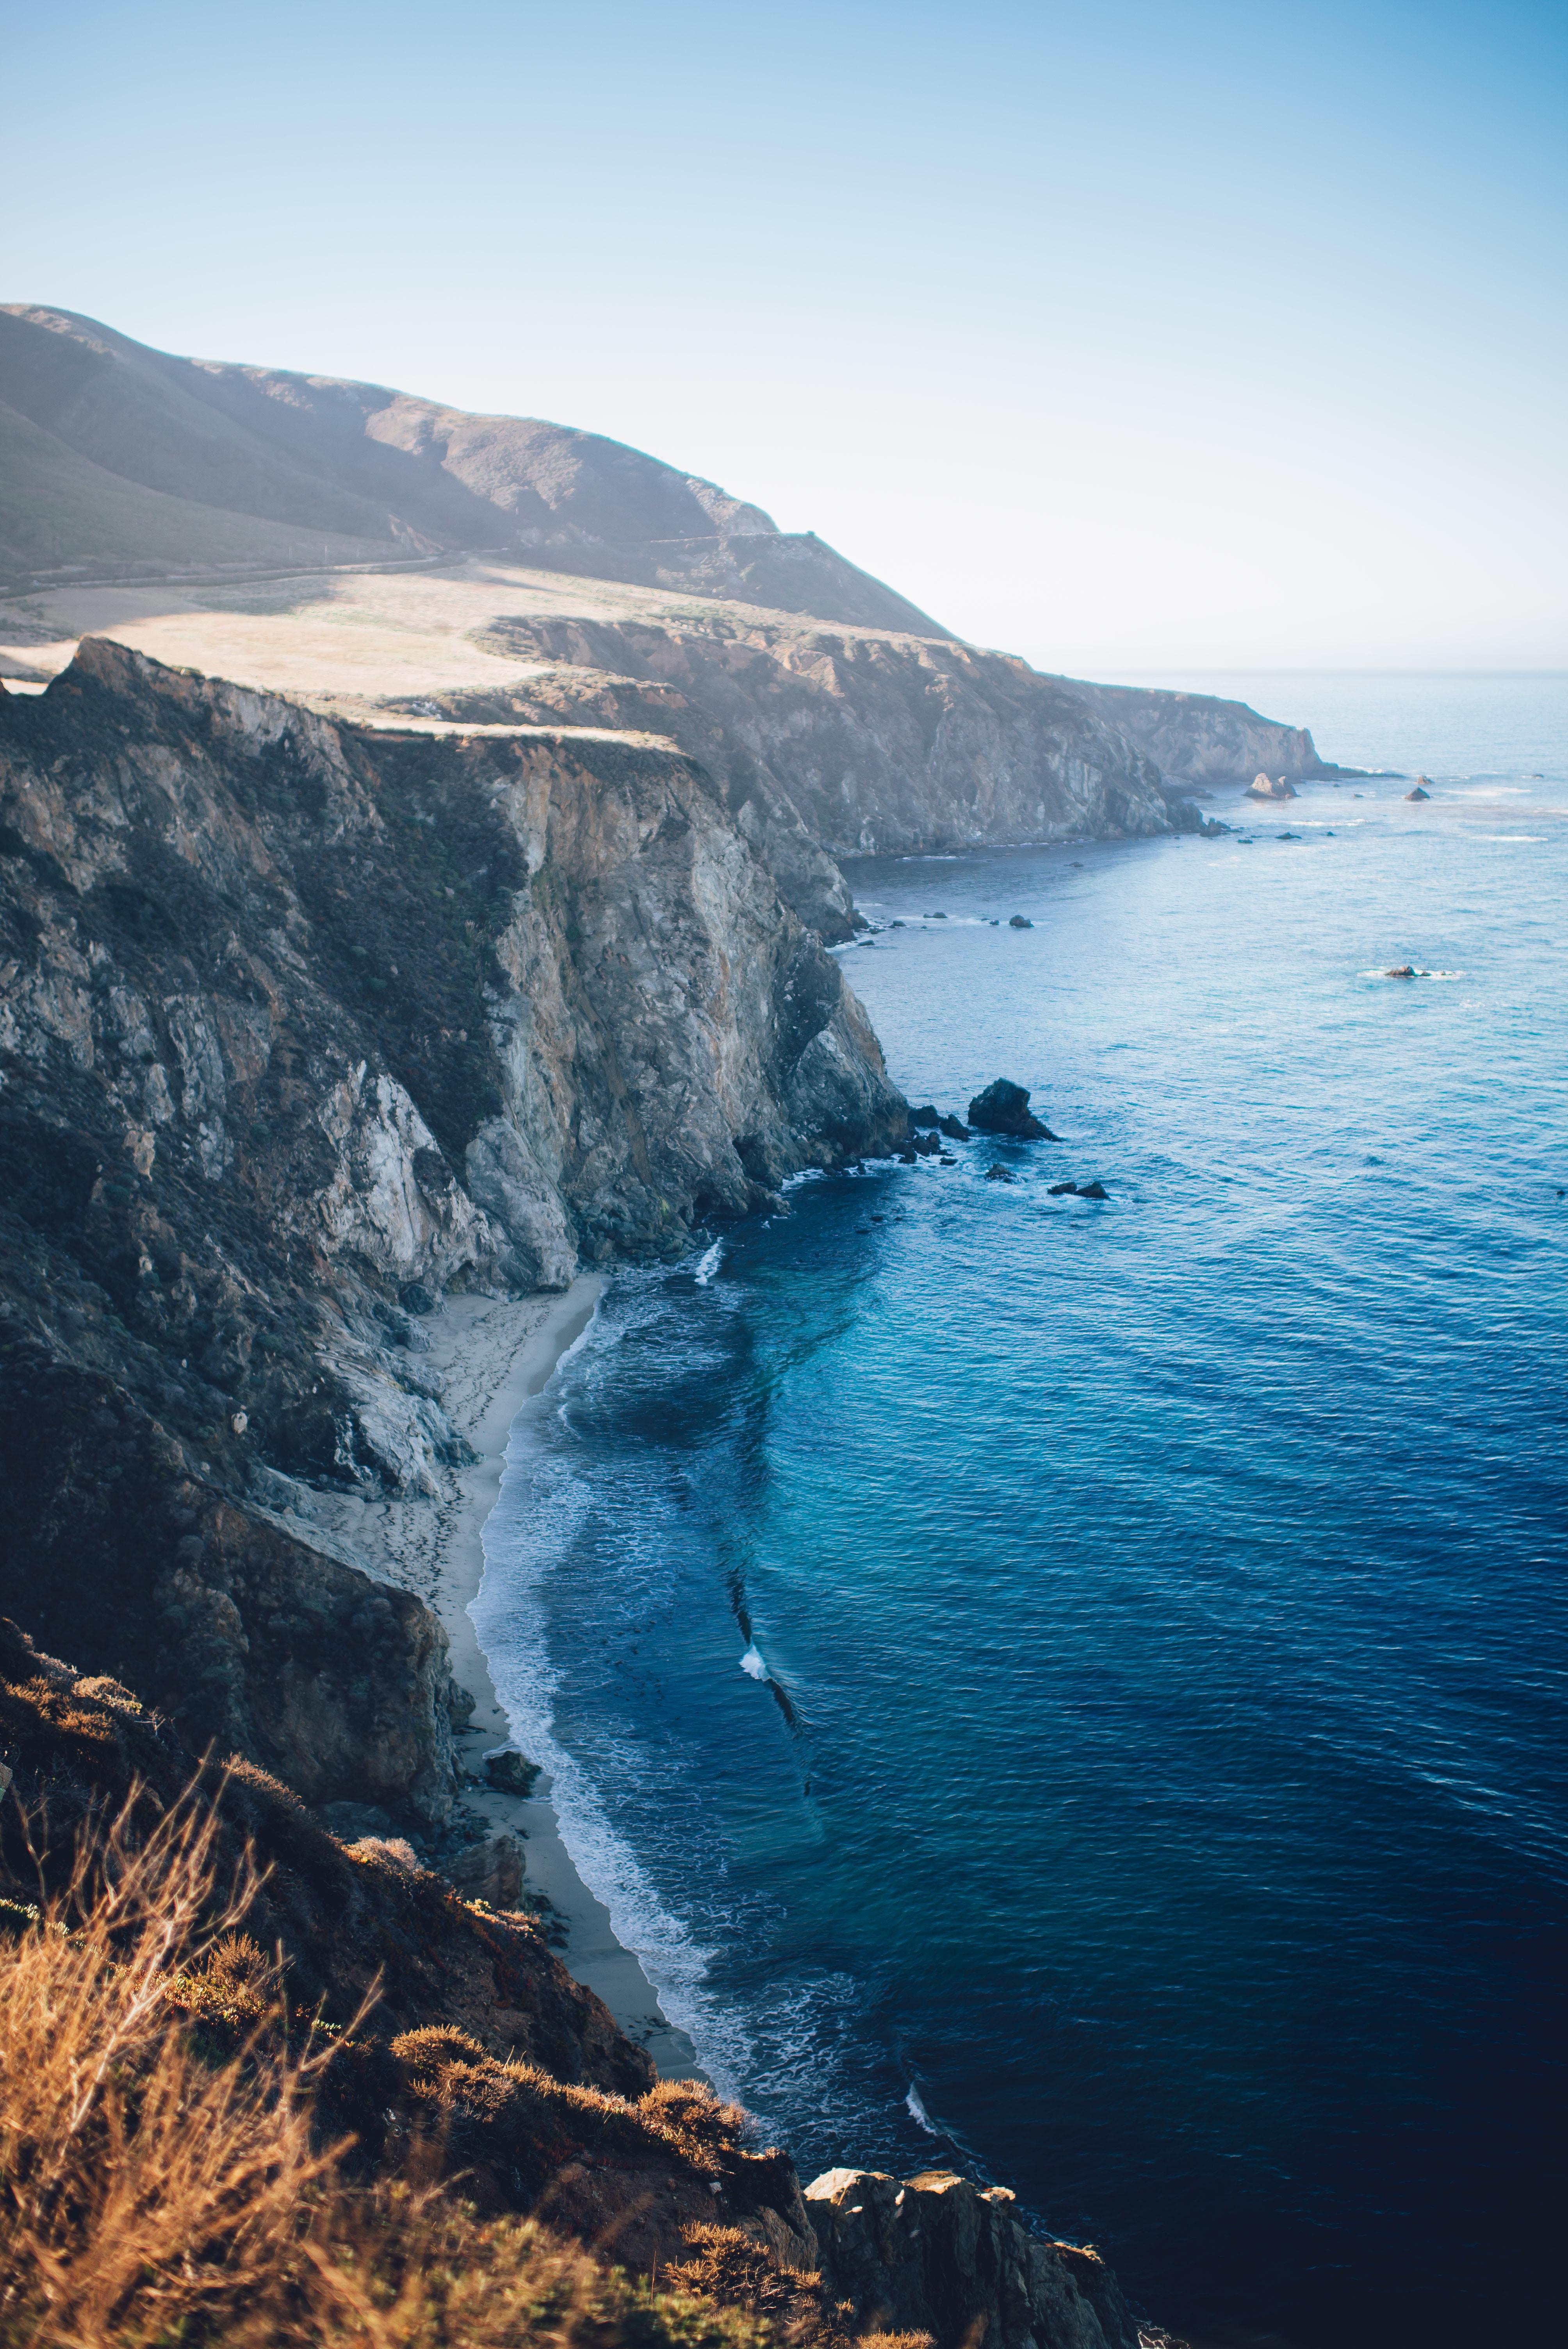 photo of cliff near shore